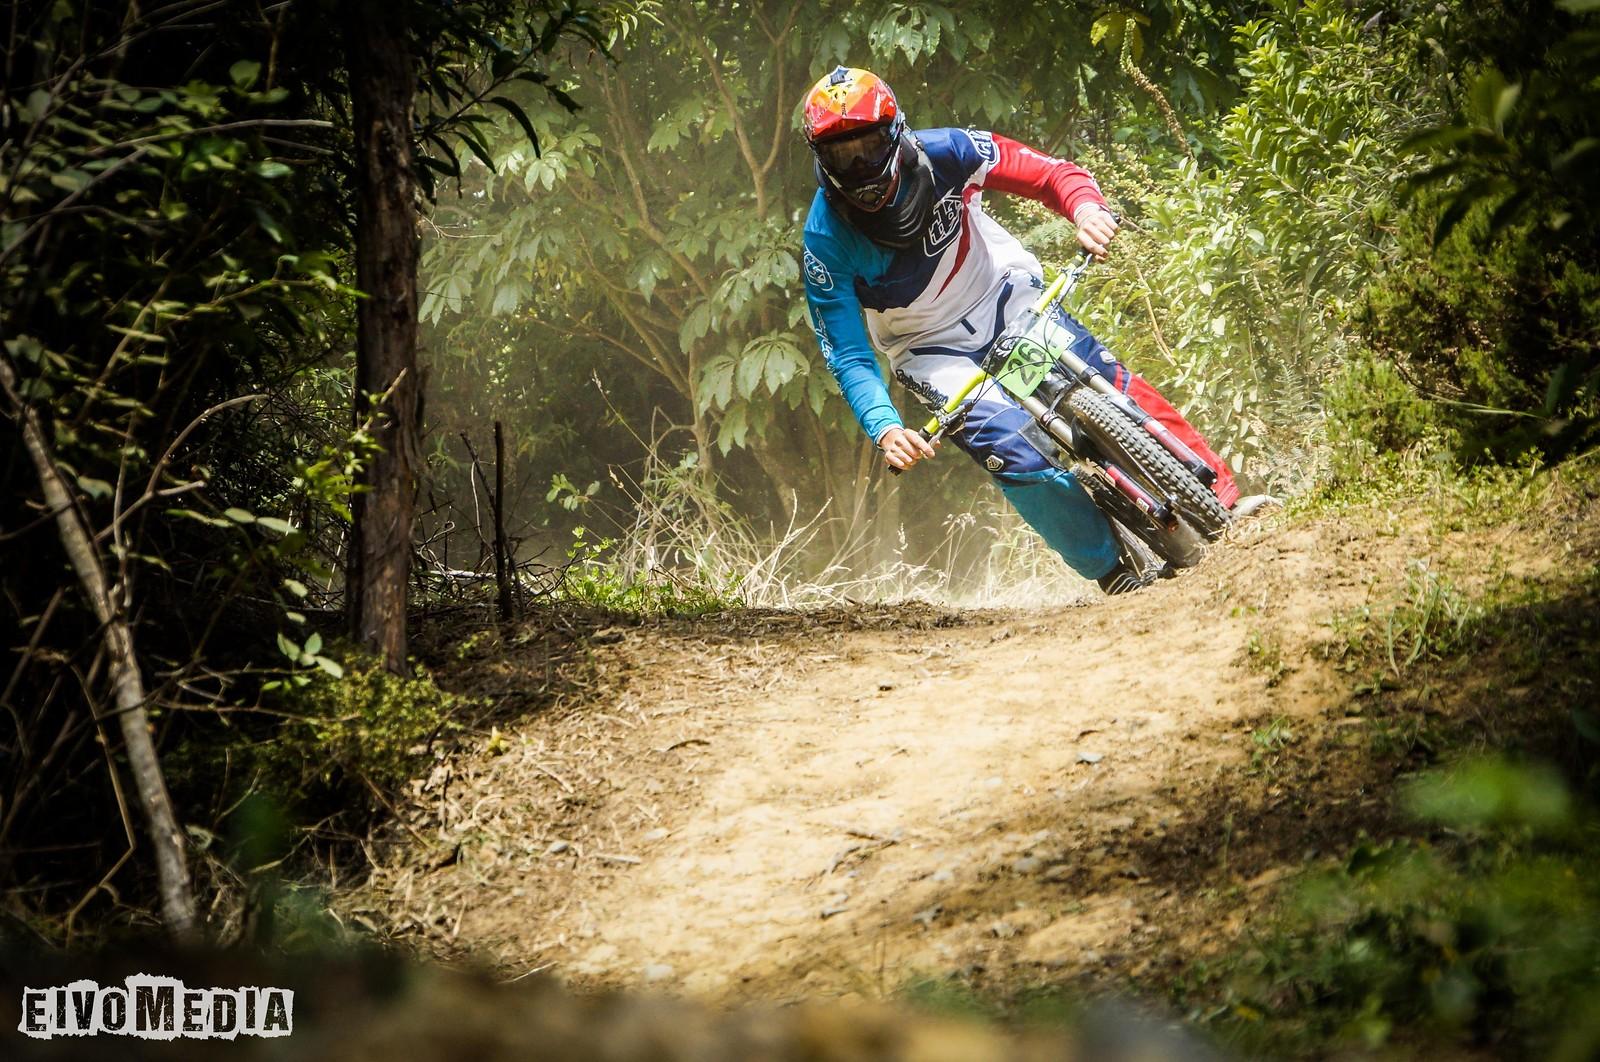 Hunua DH-6 - EIVOMEDIA - Mountain Biking Pictures - Vital MTB